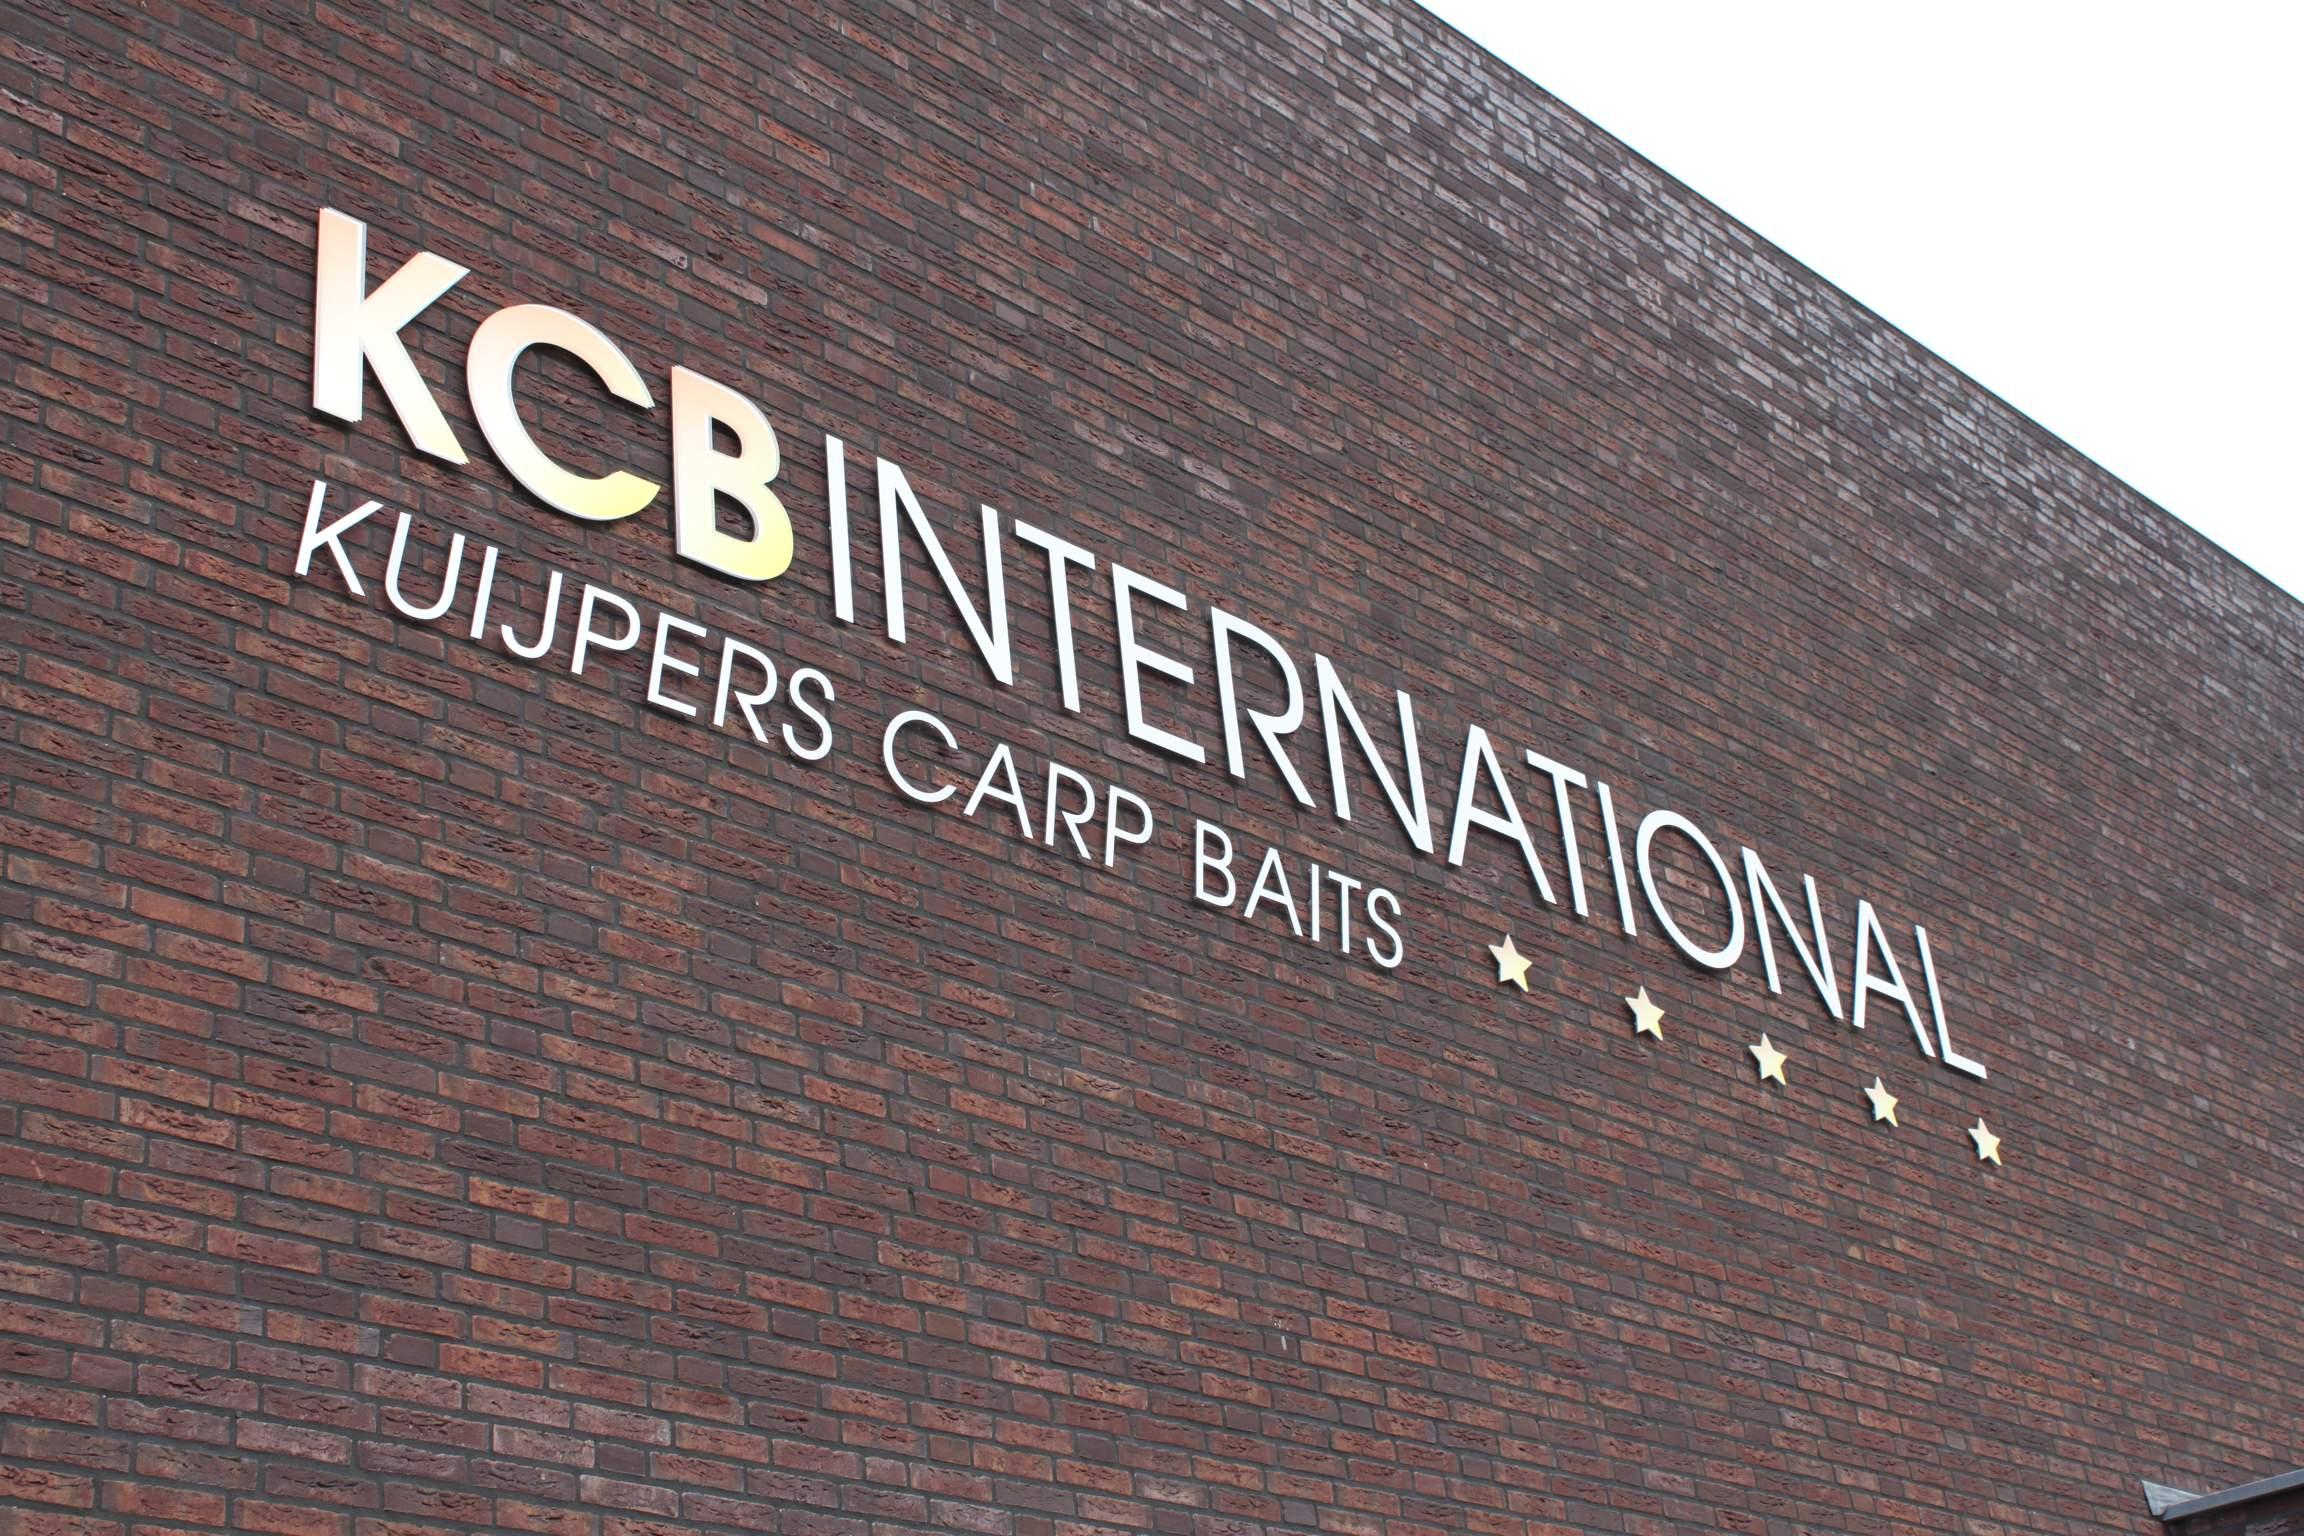 KCB Home